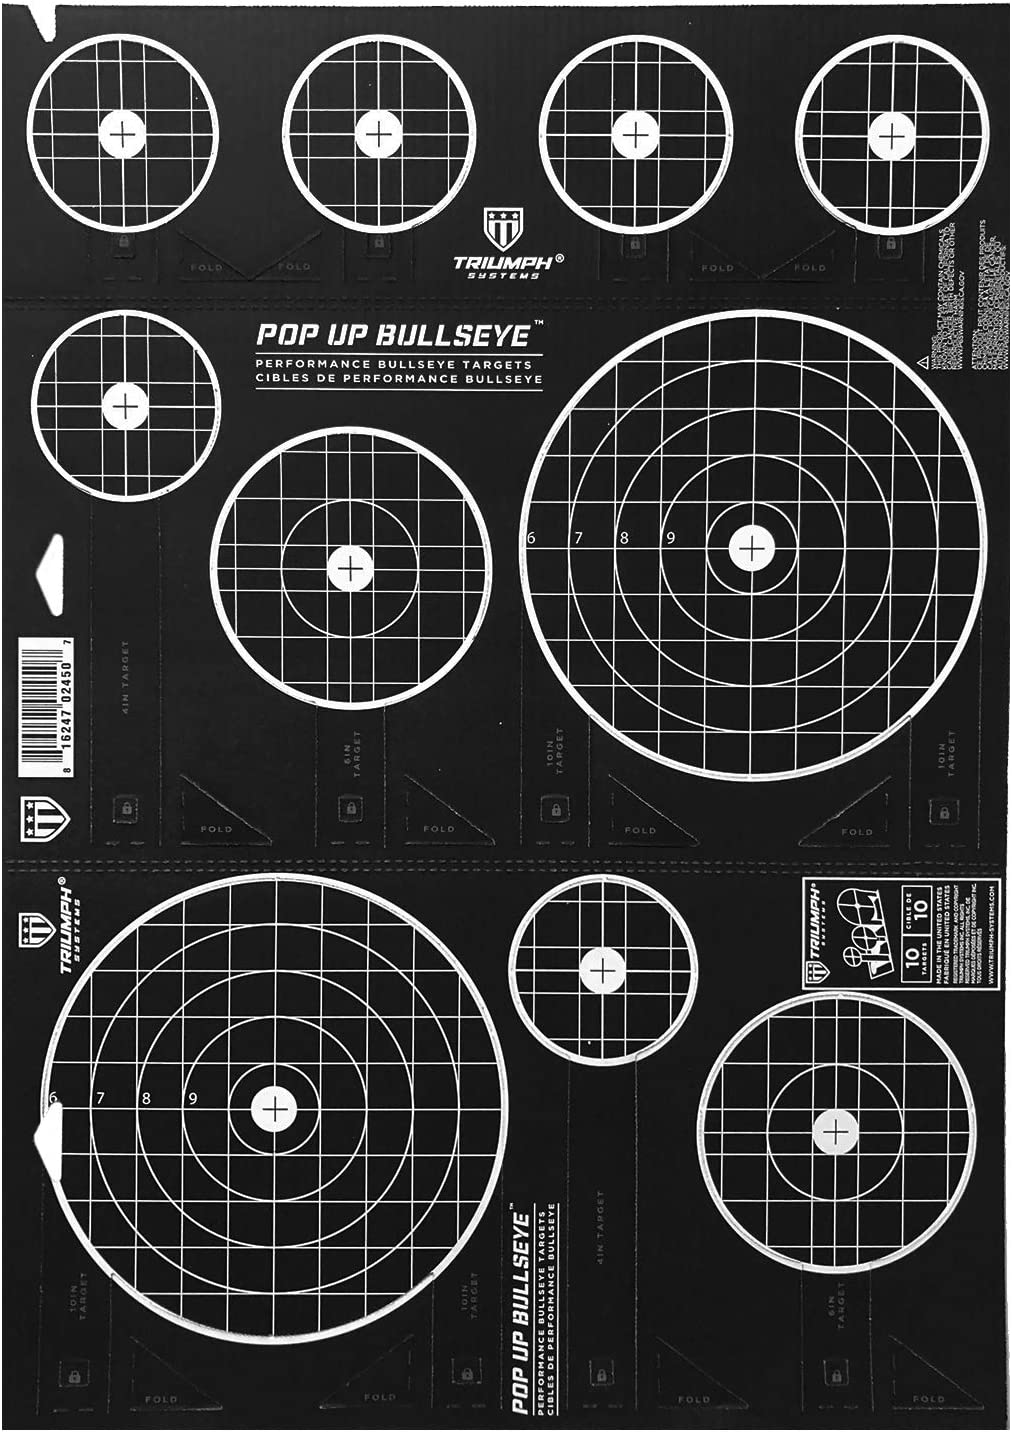 Triumph Systems Pop Up Bullseye Target 30 22 x Max 72% OFF New life Cardboard